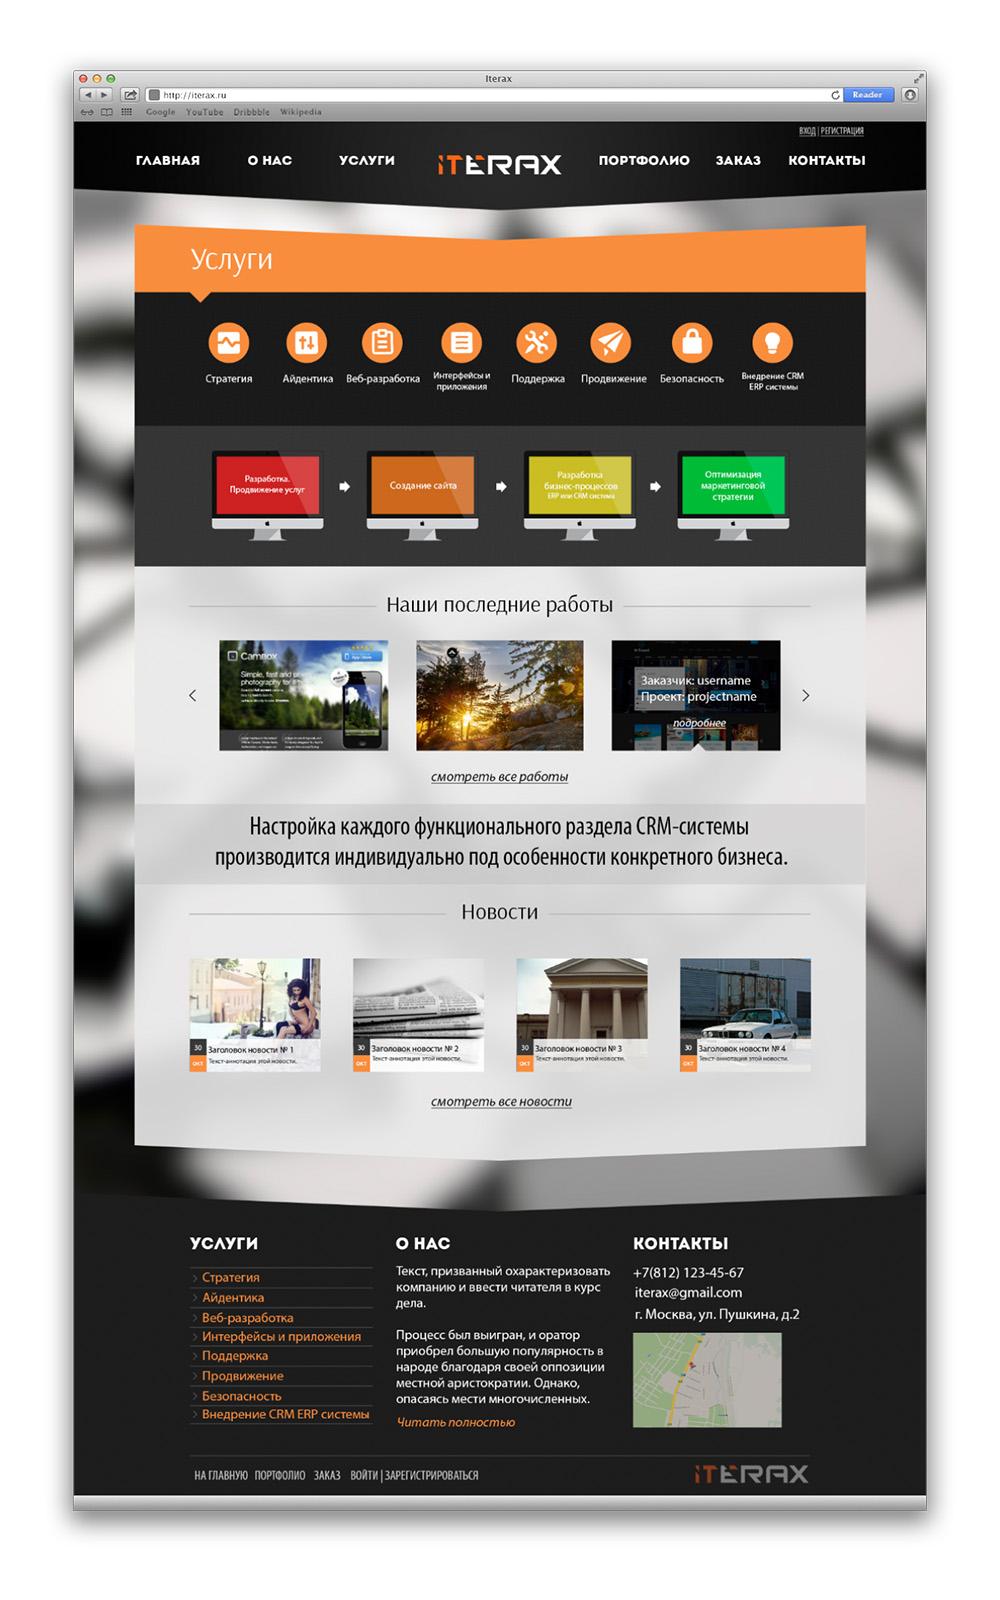 Iterax – дизайн для сайта компании